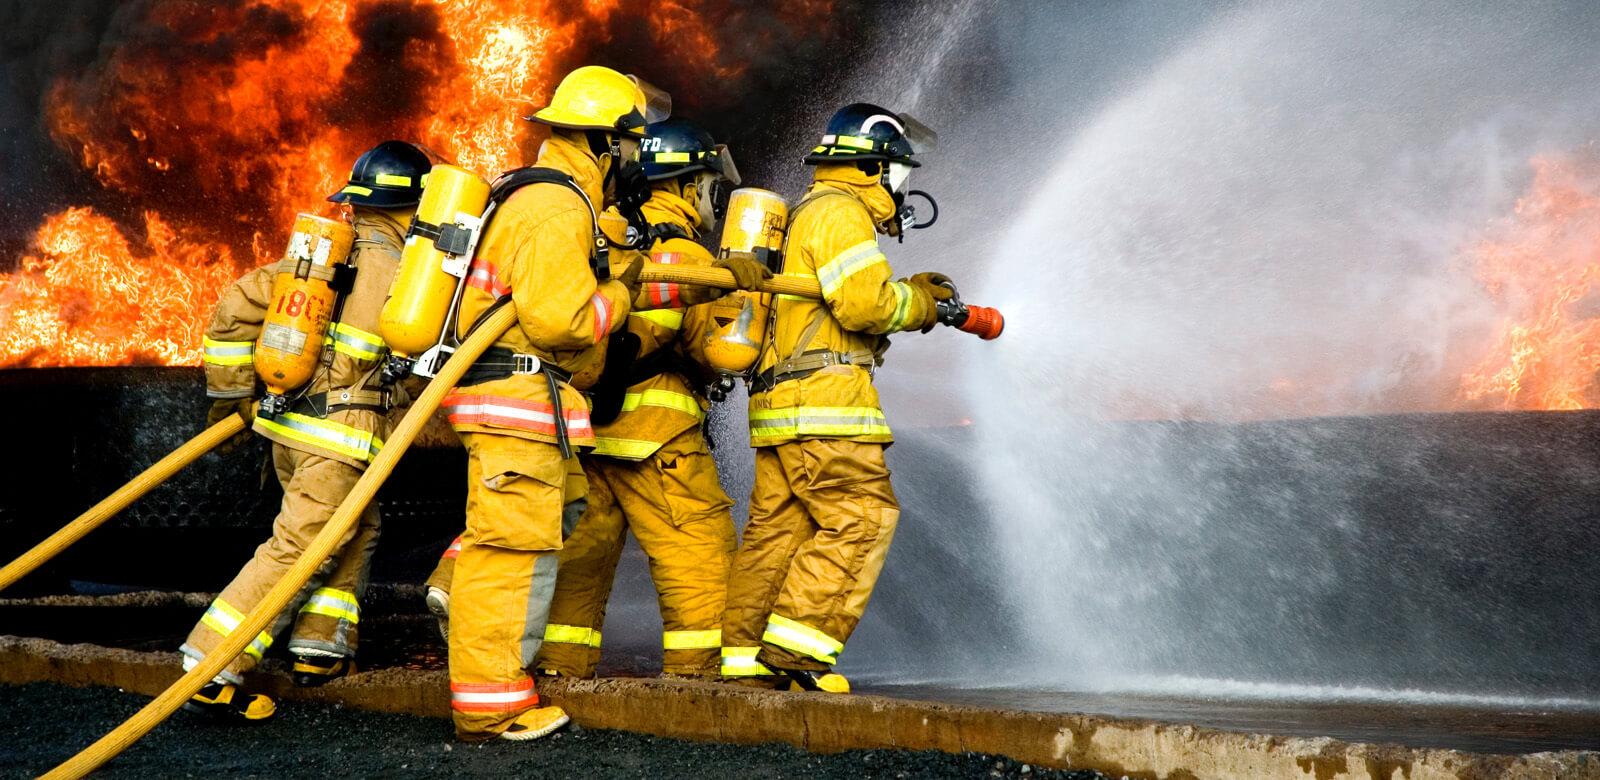 Tipos de agua para extinguir incendios